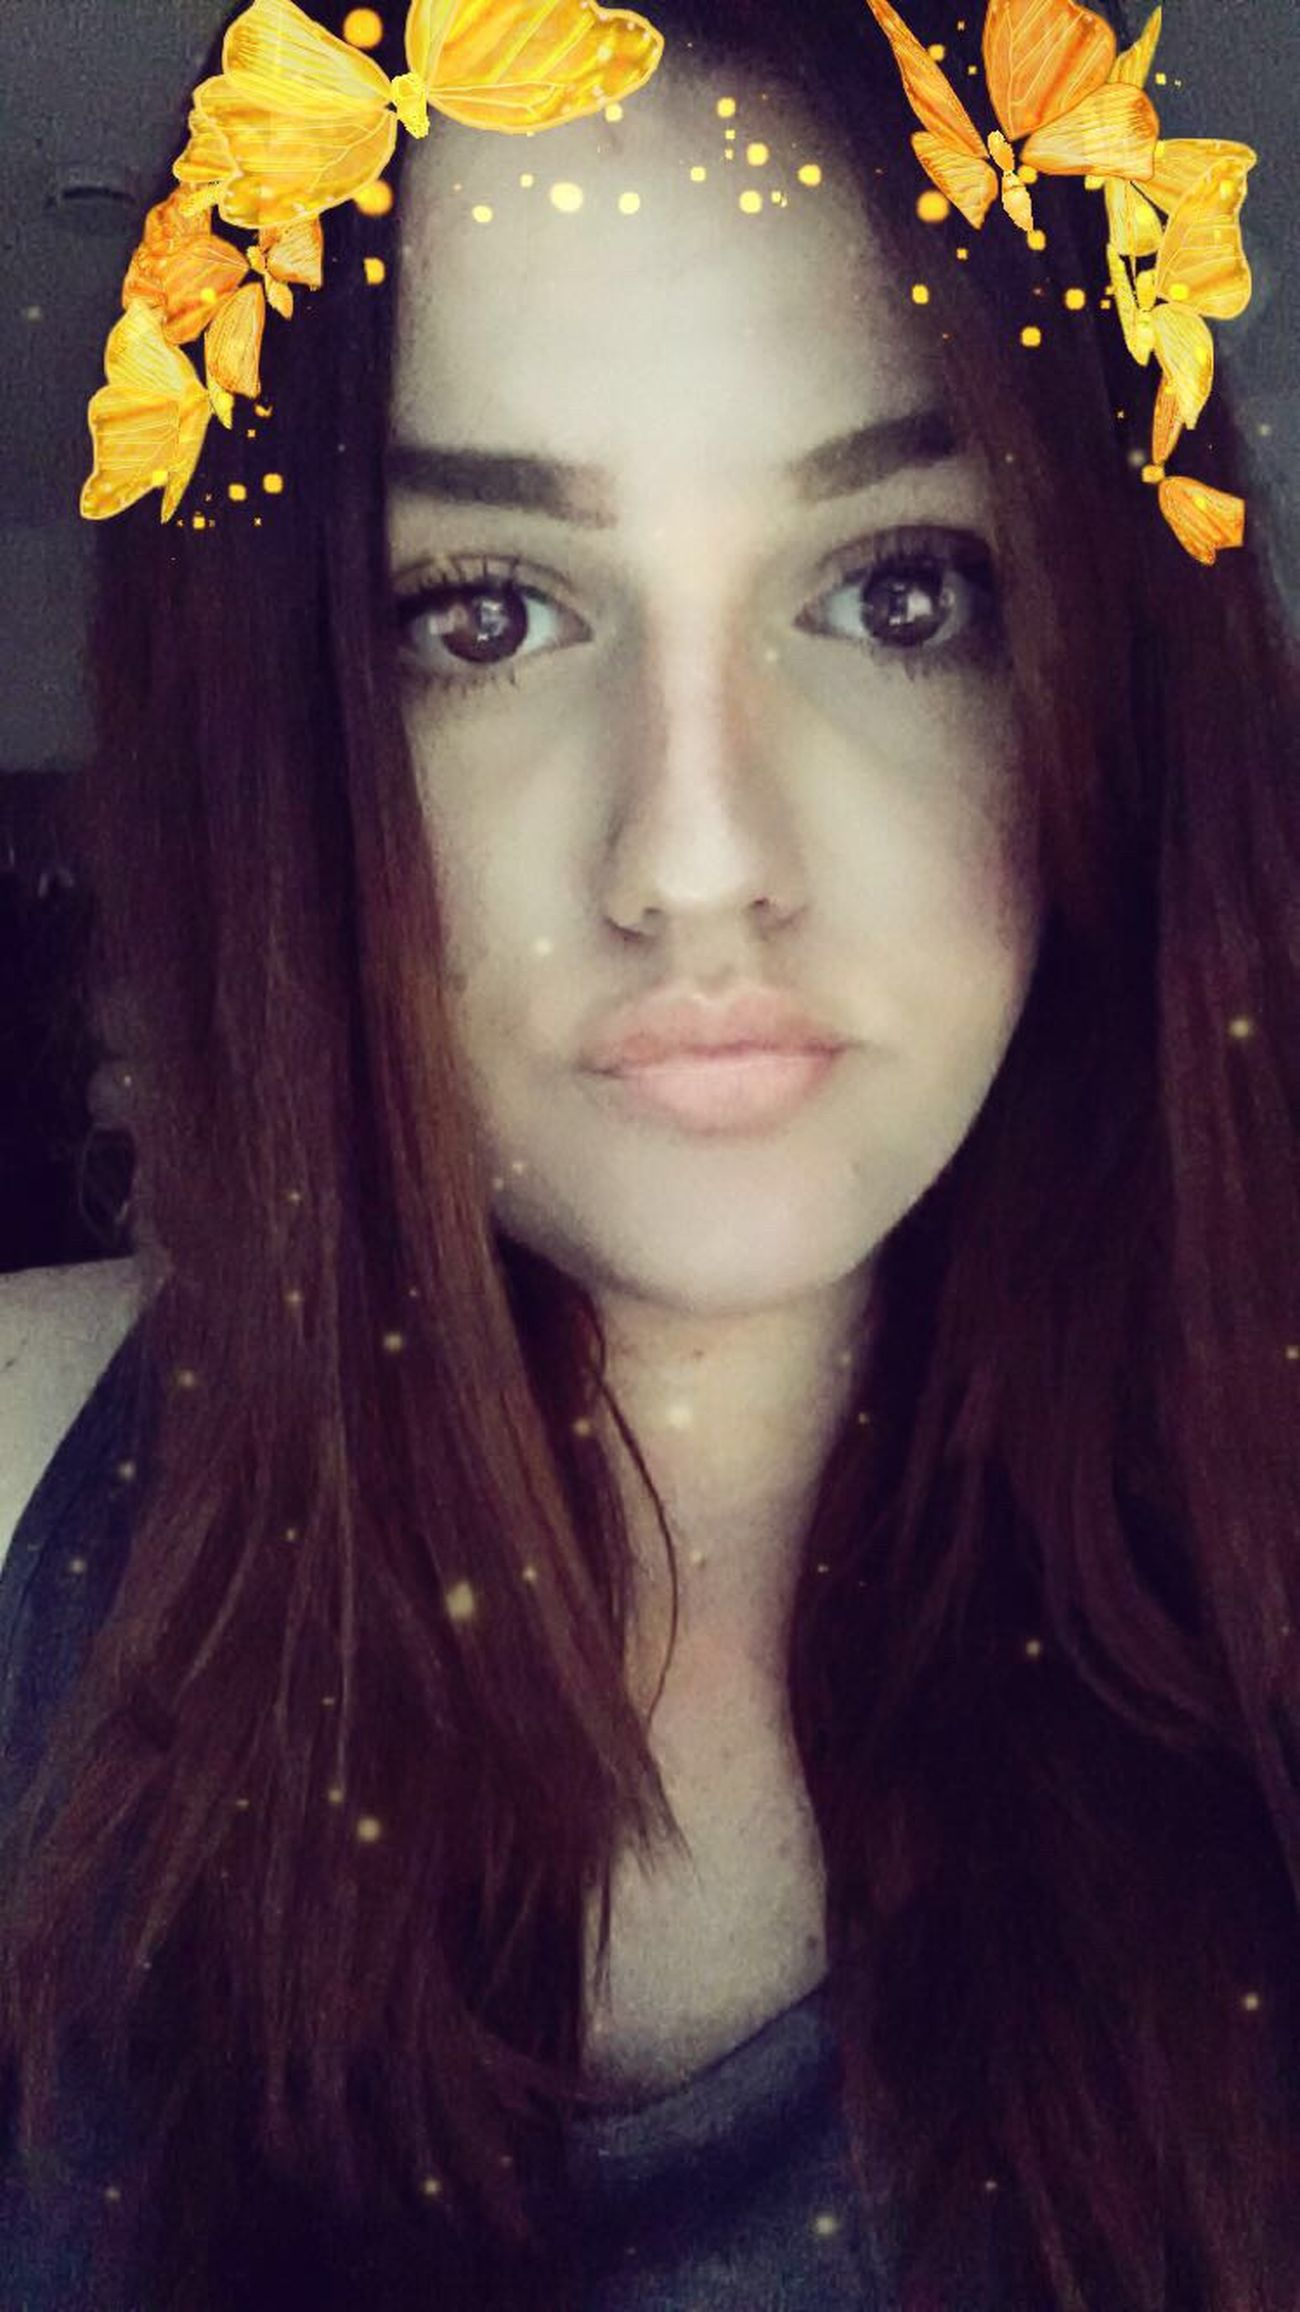 Enjoying Life C4c Iphonesia Selfie ✌ Filter Snapchatme 👉🏻 lifewithlorena Follow German Hey✌ Snap 👉🏻 lifewithlorena (null) Like4like Germany Poland Followme Snapchat 👉🏻 lifewithlorena Polishgirl POTD Polish Nice Love Myself Lovely Europe Likeforlike